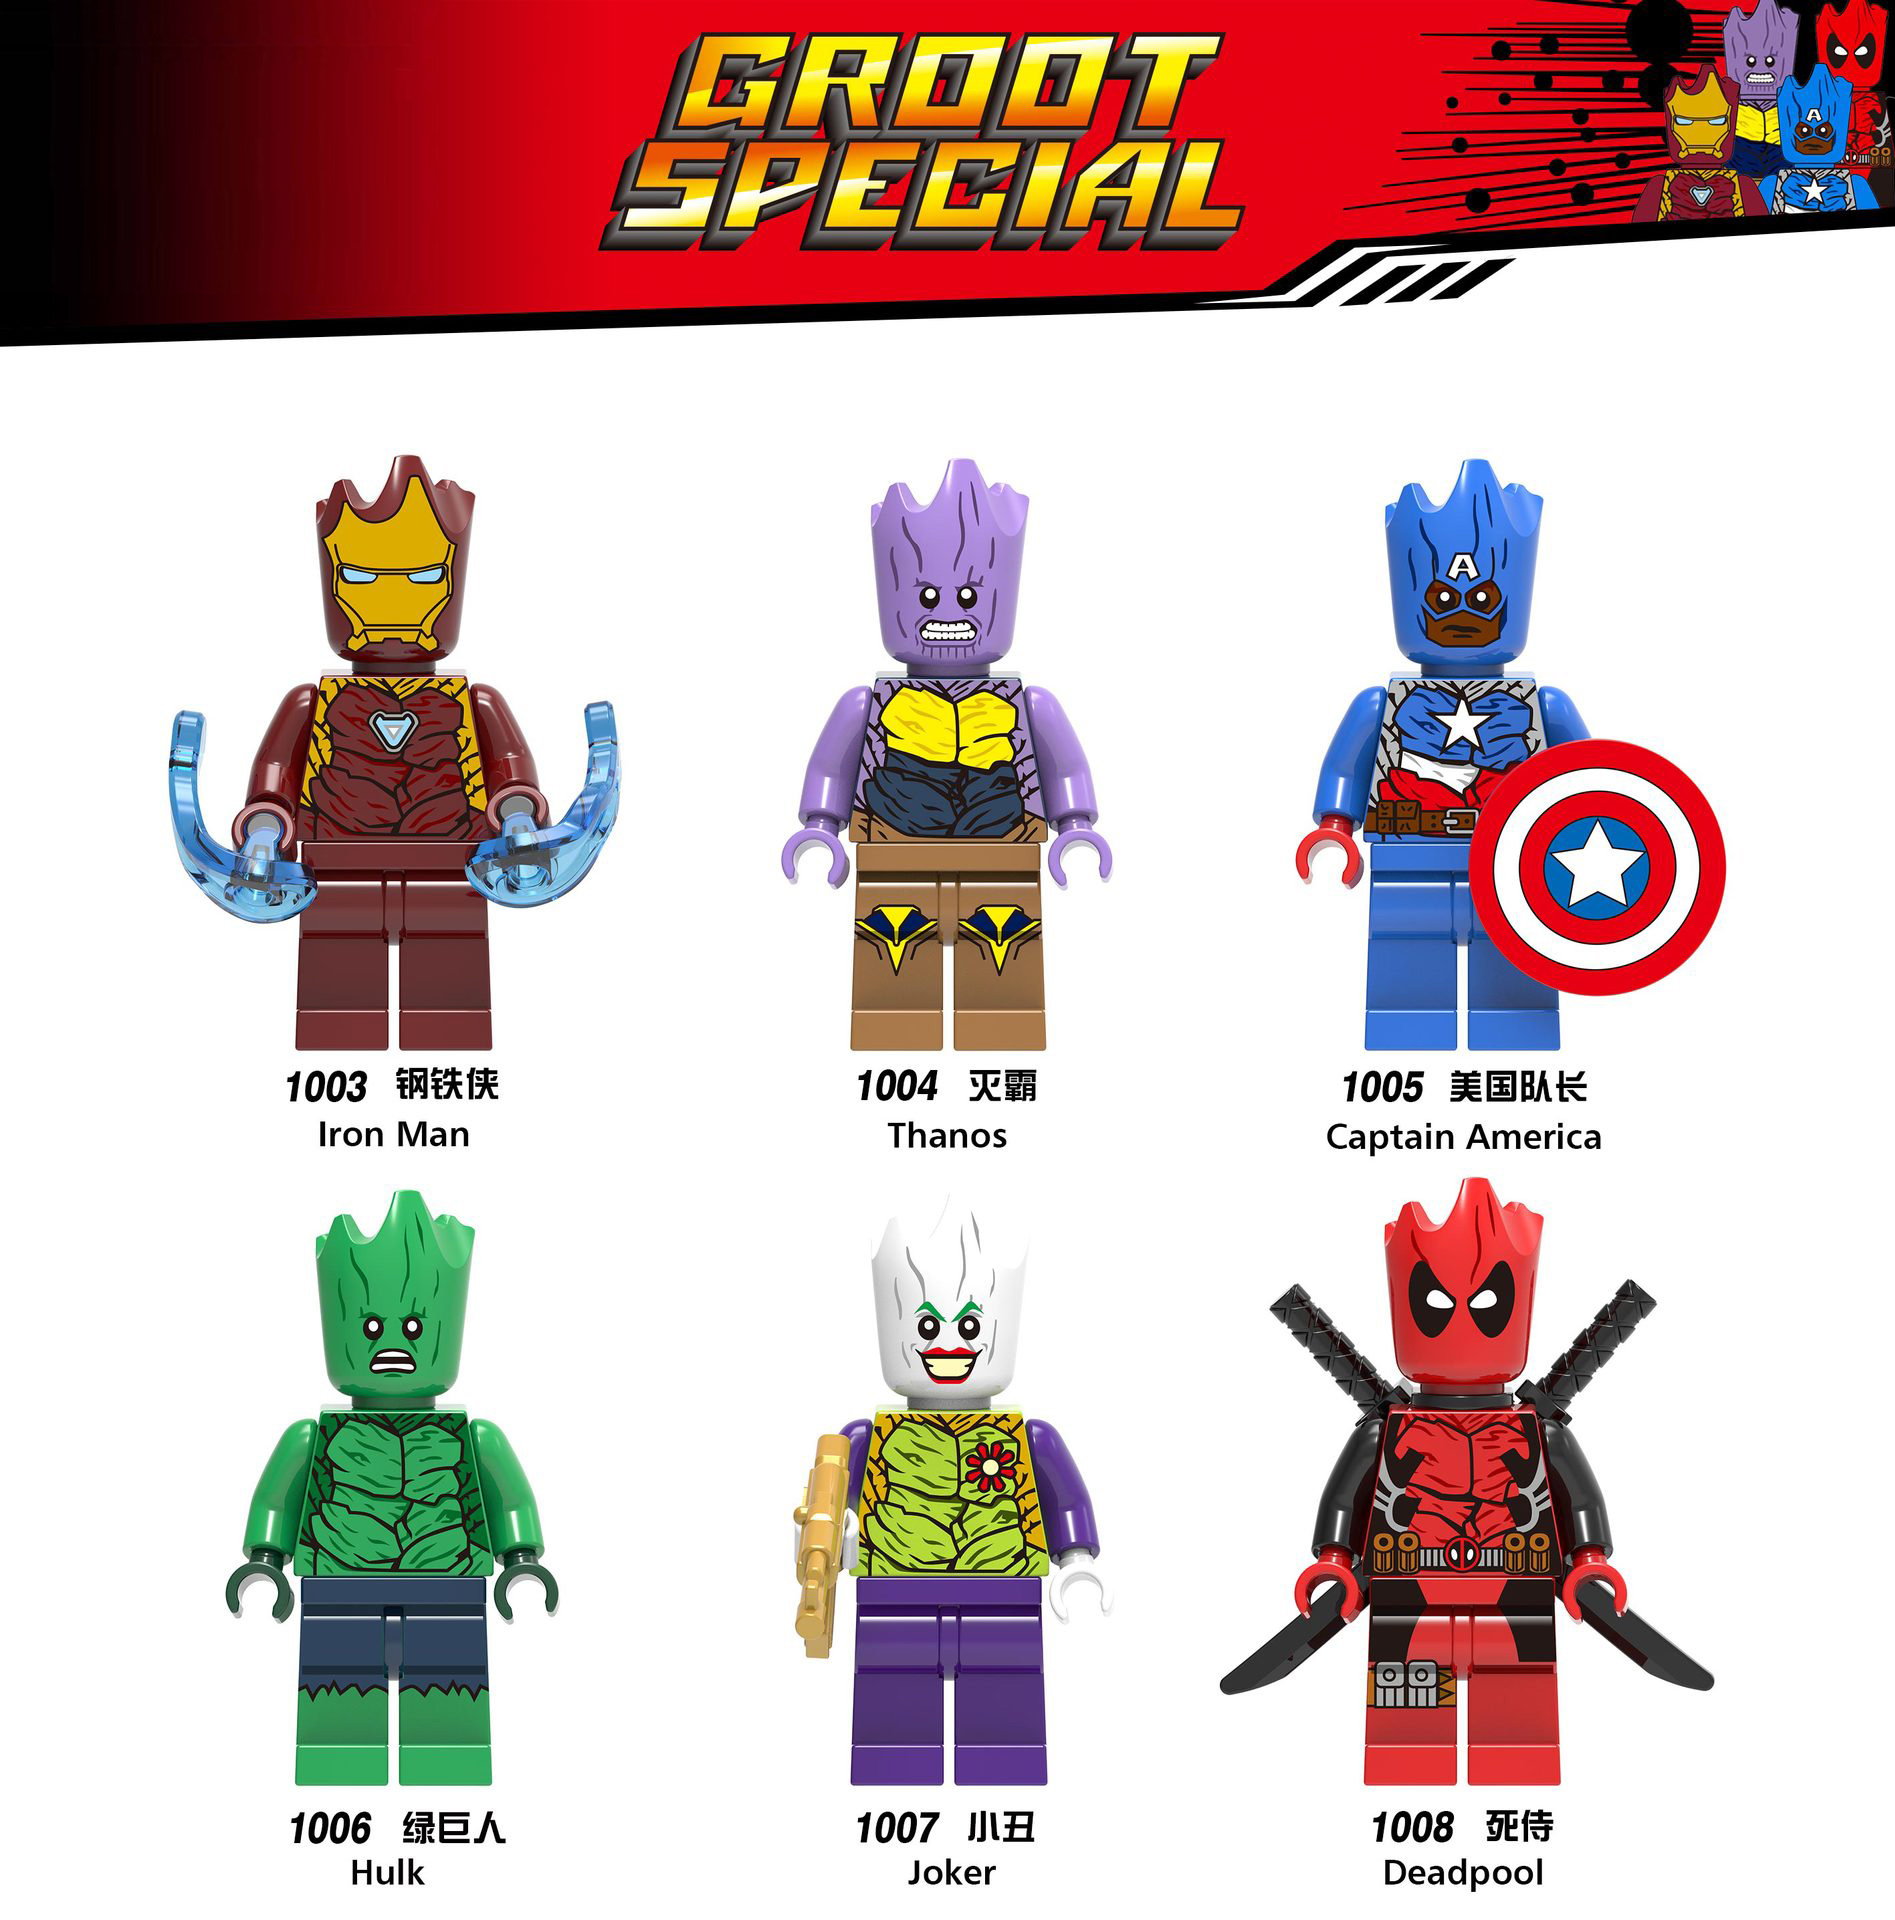 Marvel DC Tree Man Iron Man Thanos Captain America Hulk Joker Deadpool Action Figures Building Blocks Bricks Toys